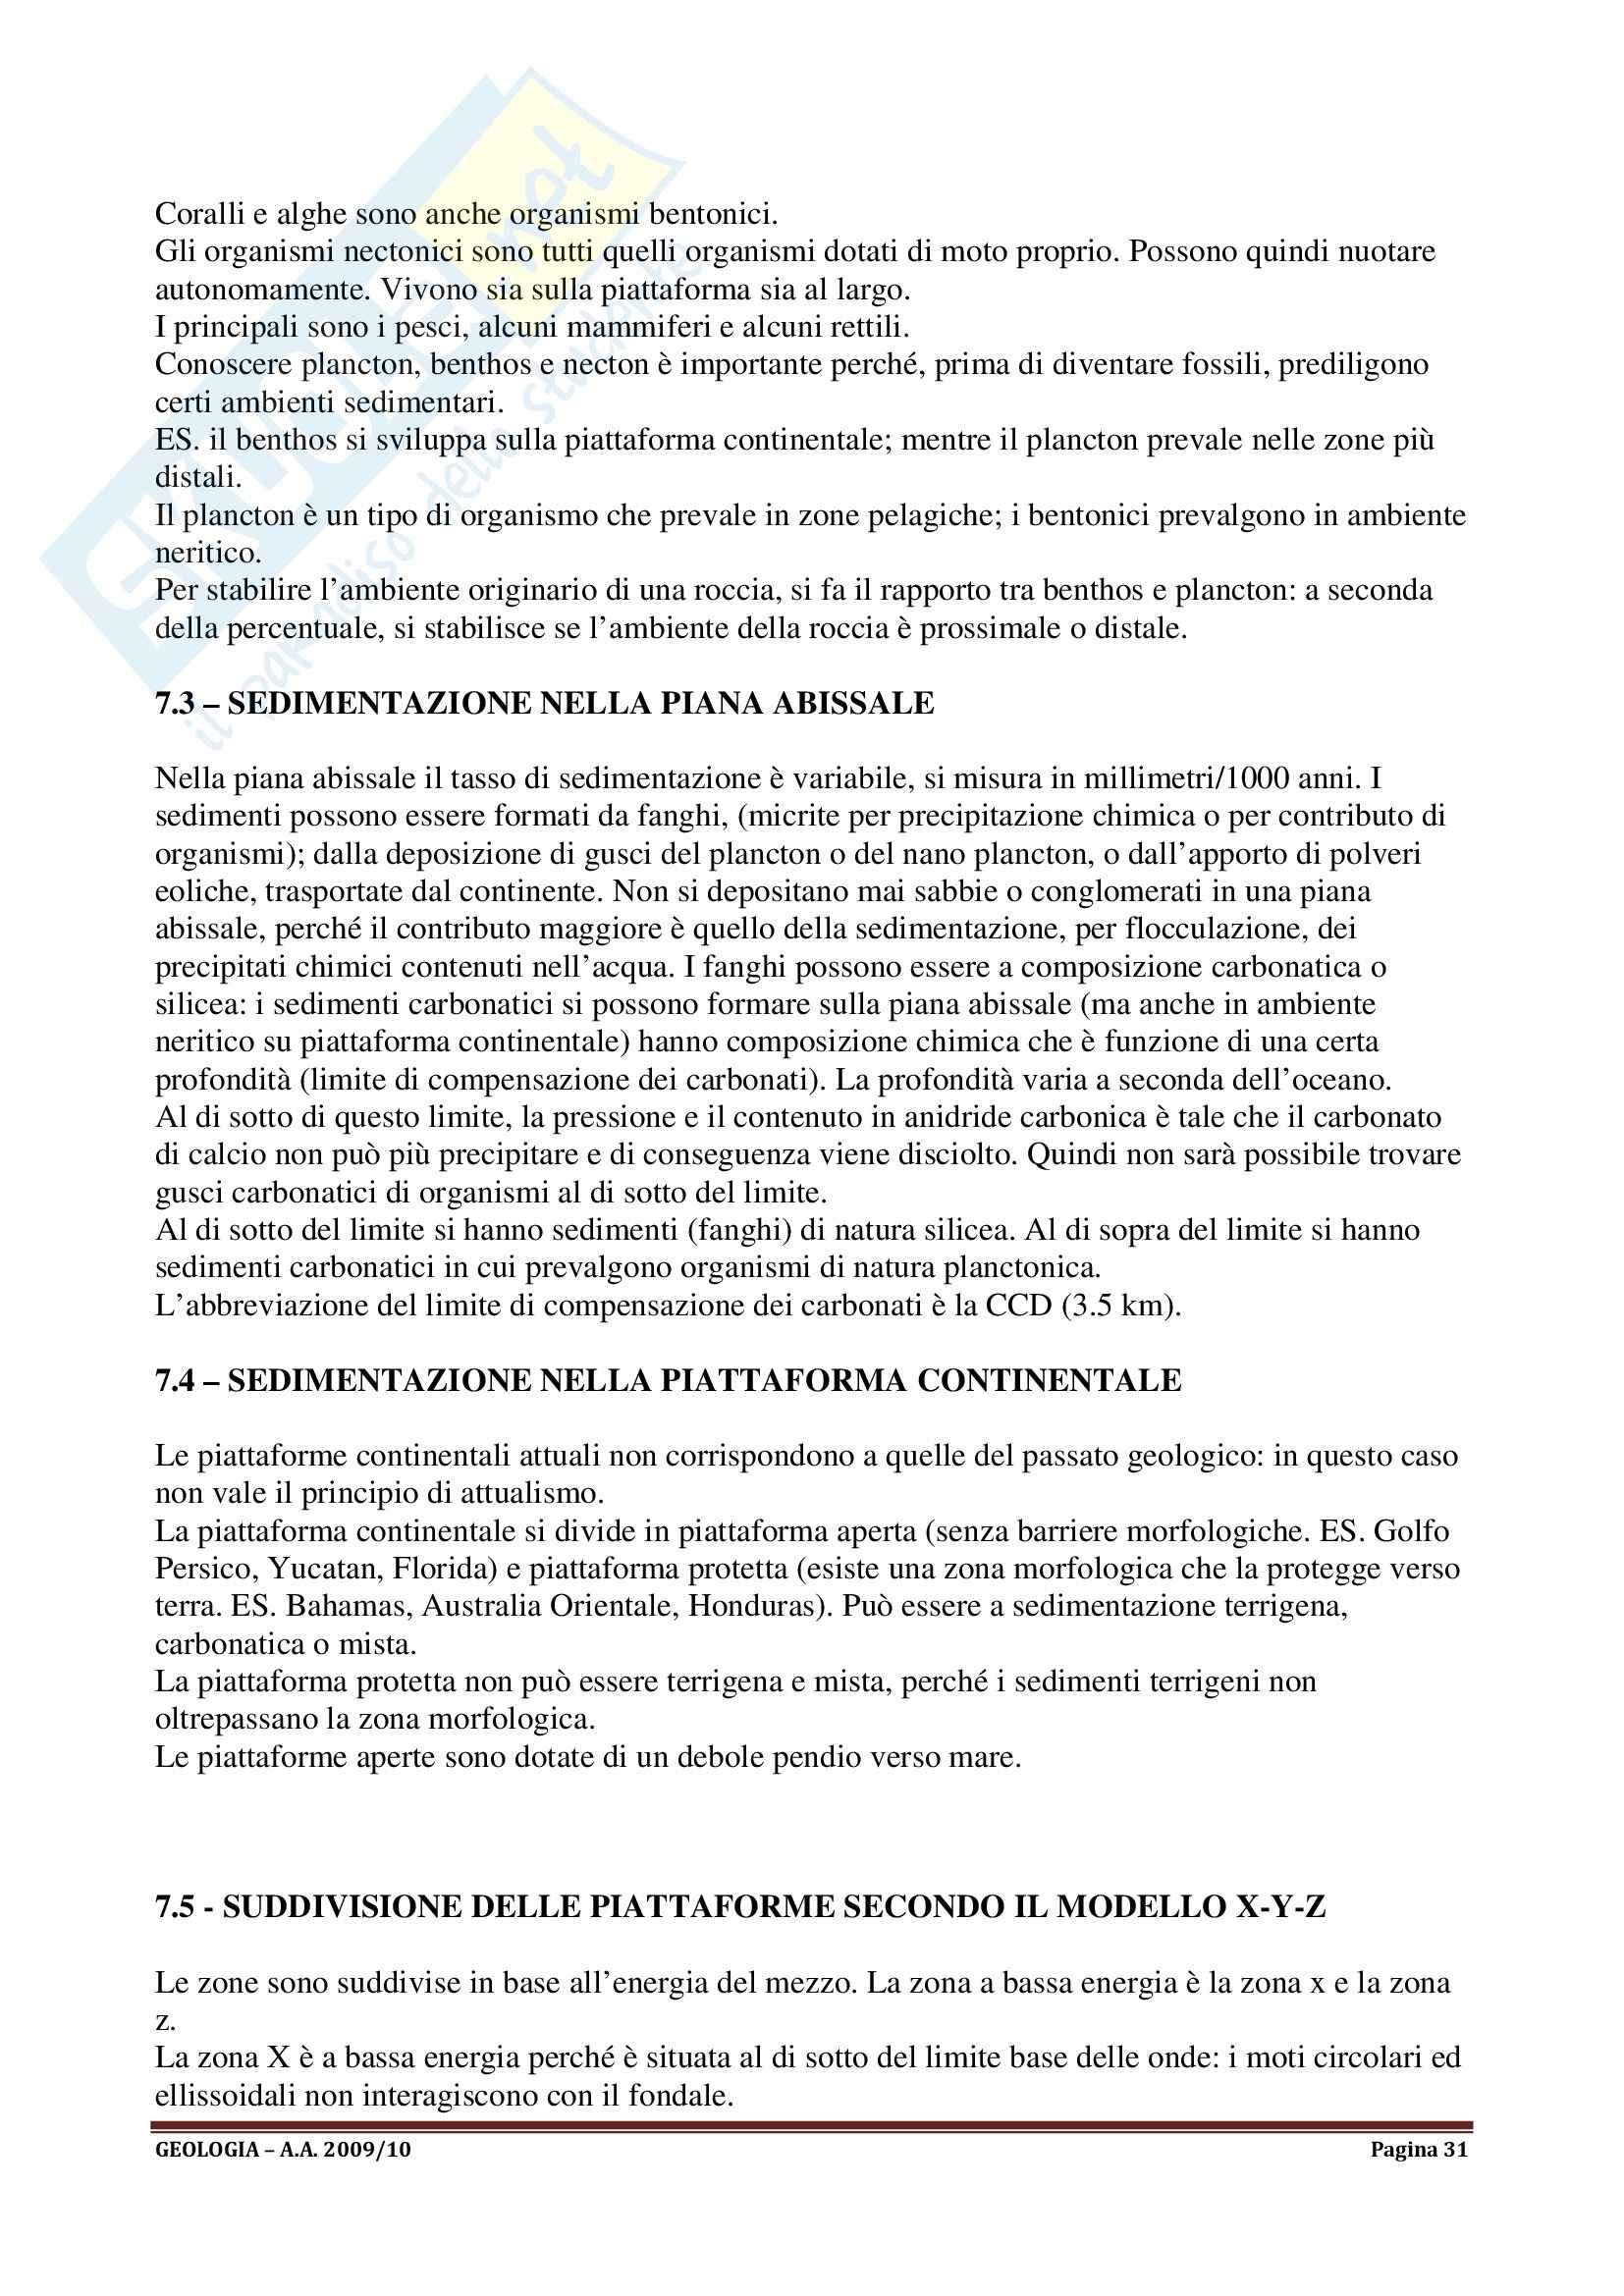 Geologia I - Appunti Pag. 31